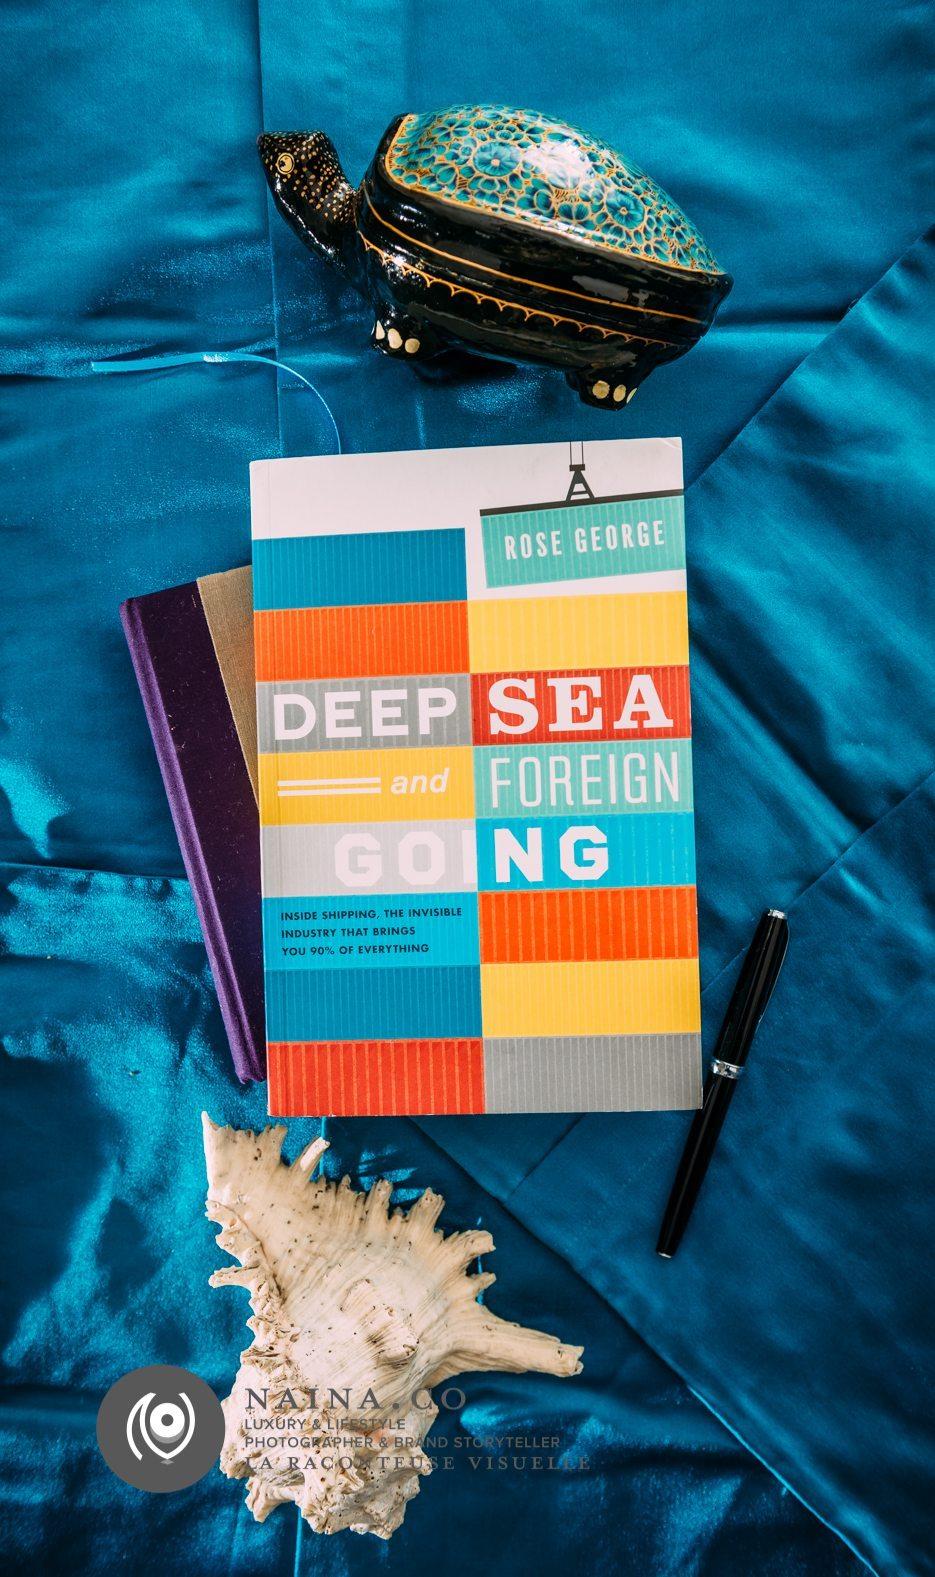 Naina.co-Raconteuse-Visuelle-Photographer-Storyteller-Luxury-Lifestyle-Deep-Sea-Foreign-Going-Rose-George-EyesForPrint-Nov-2014